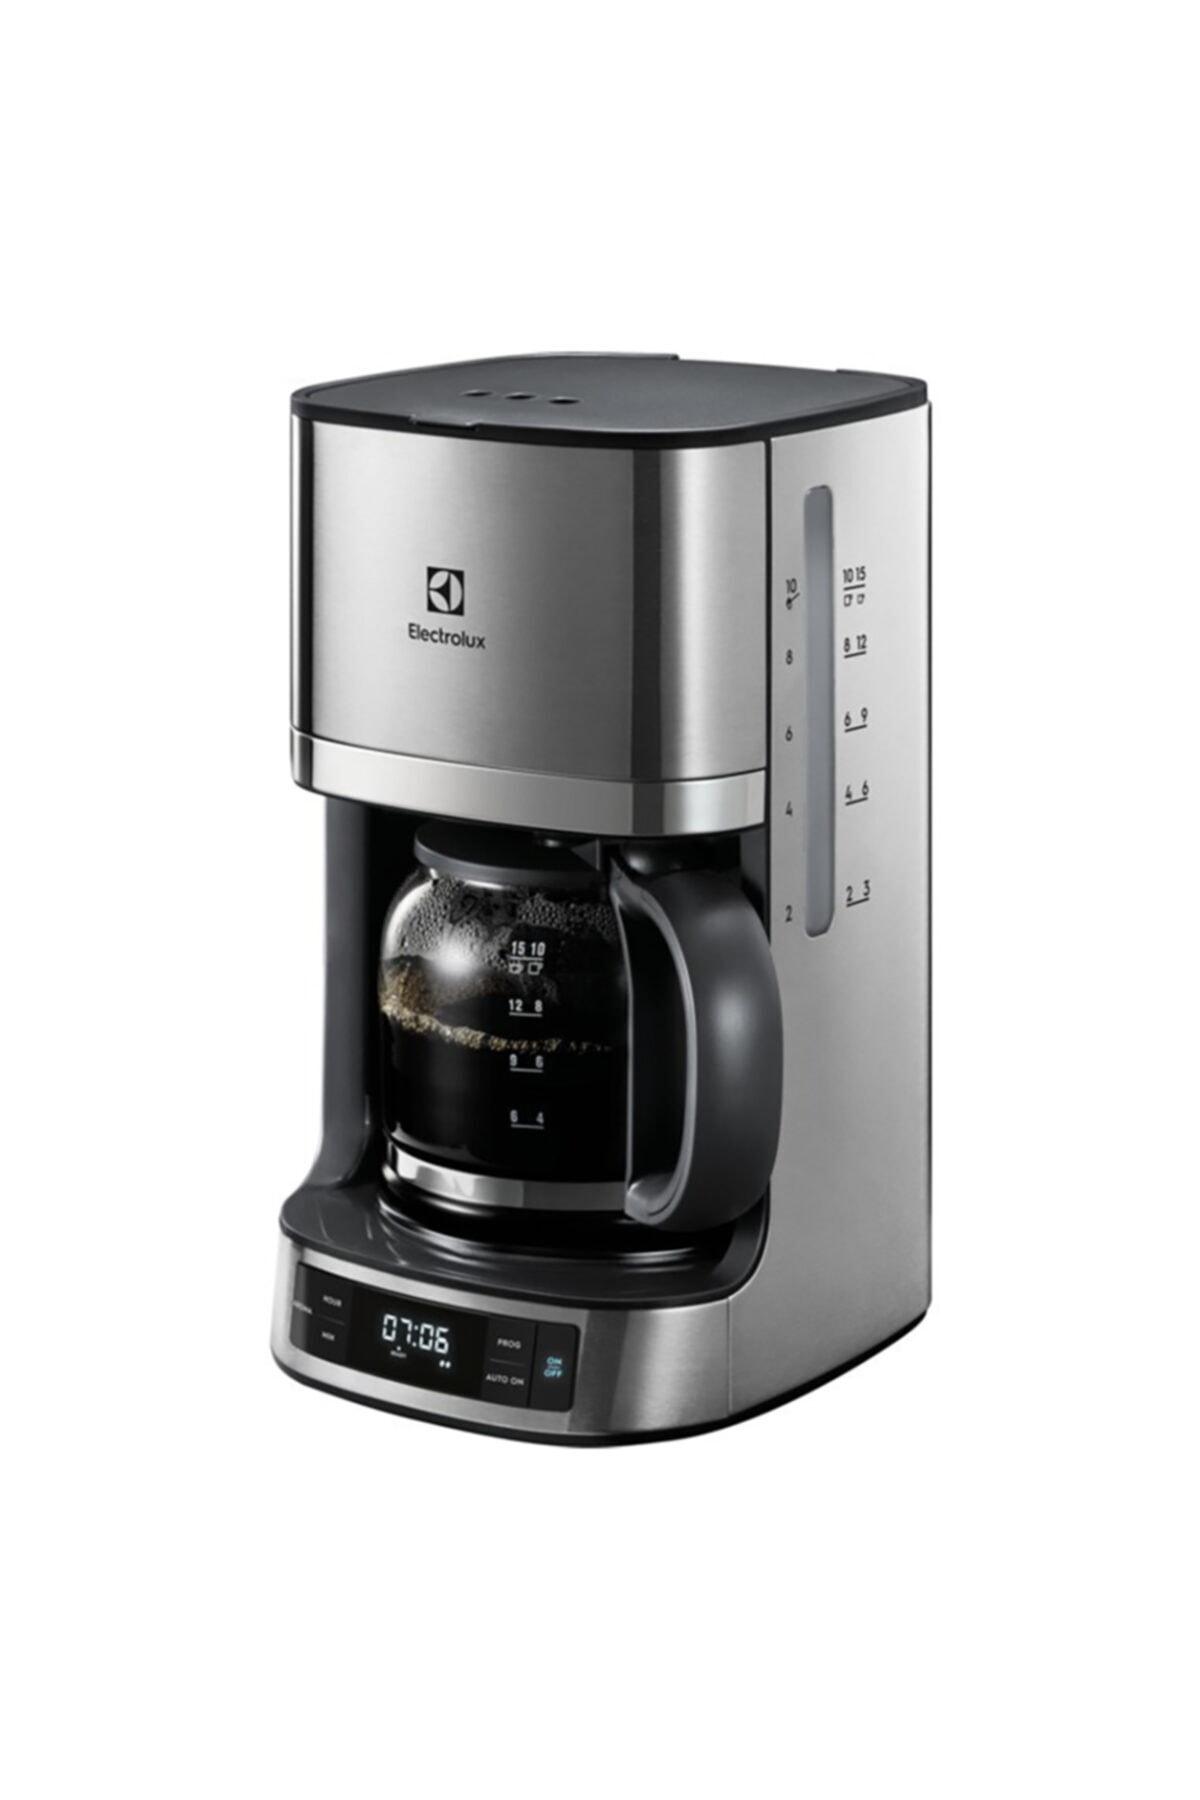 Ekf7700 1080w Aroma Ve Zaman Ayarlı Filtre Kahve Makinesi